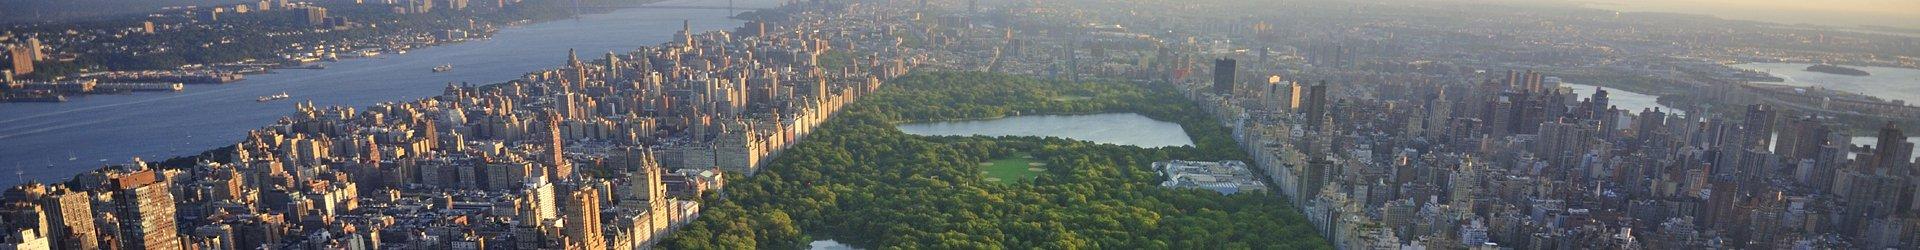 Central Park New York, Amerika